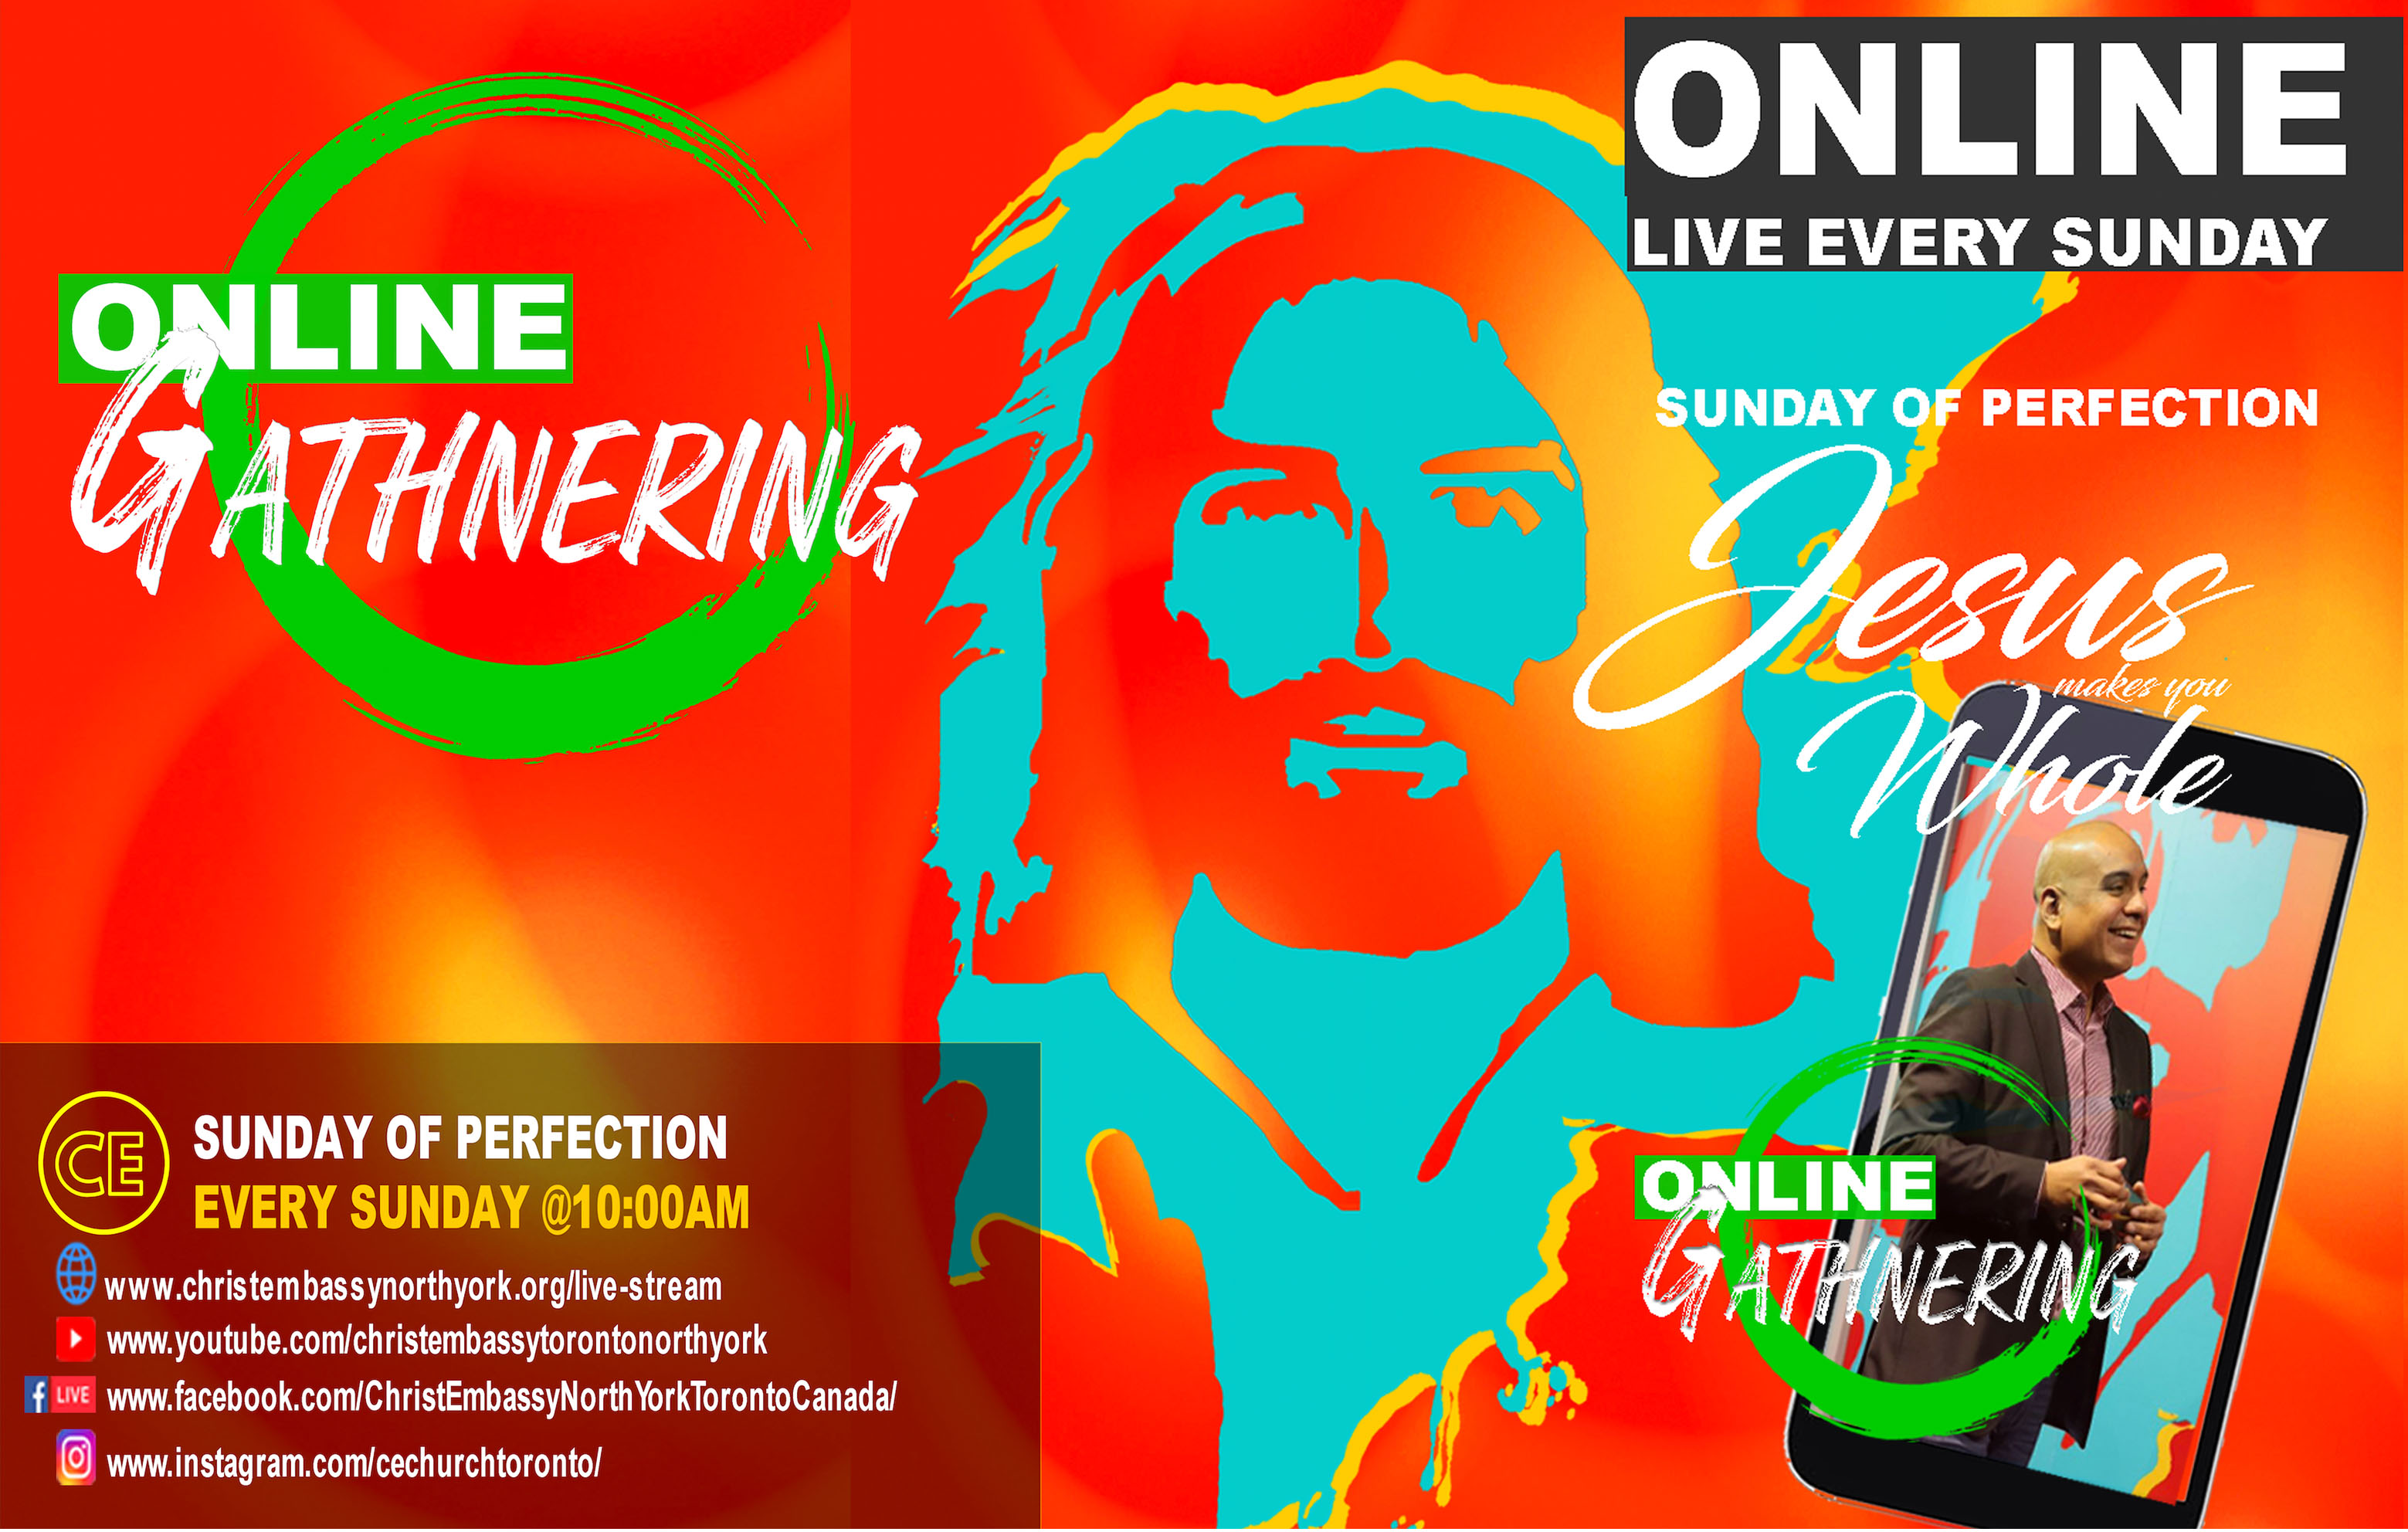 ONLINE - Sunday of Perfection (Web) Chri